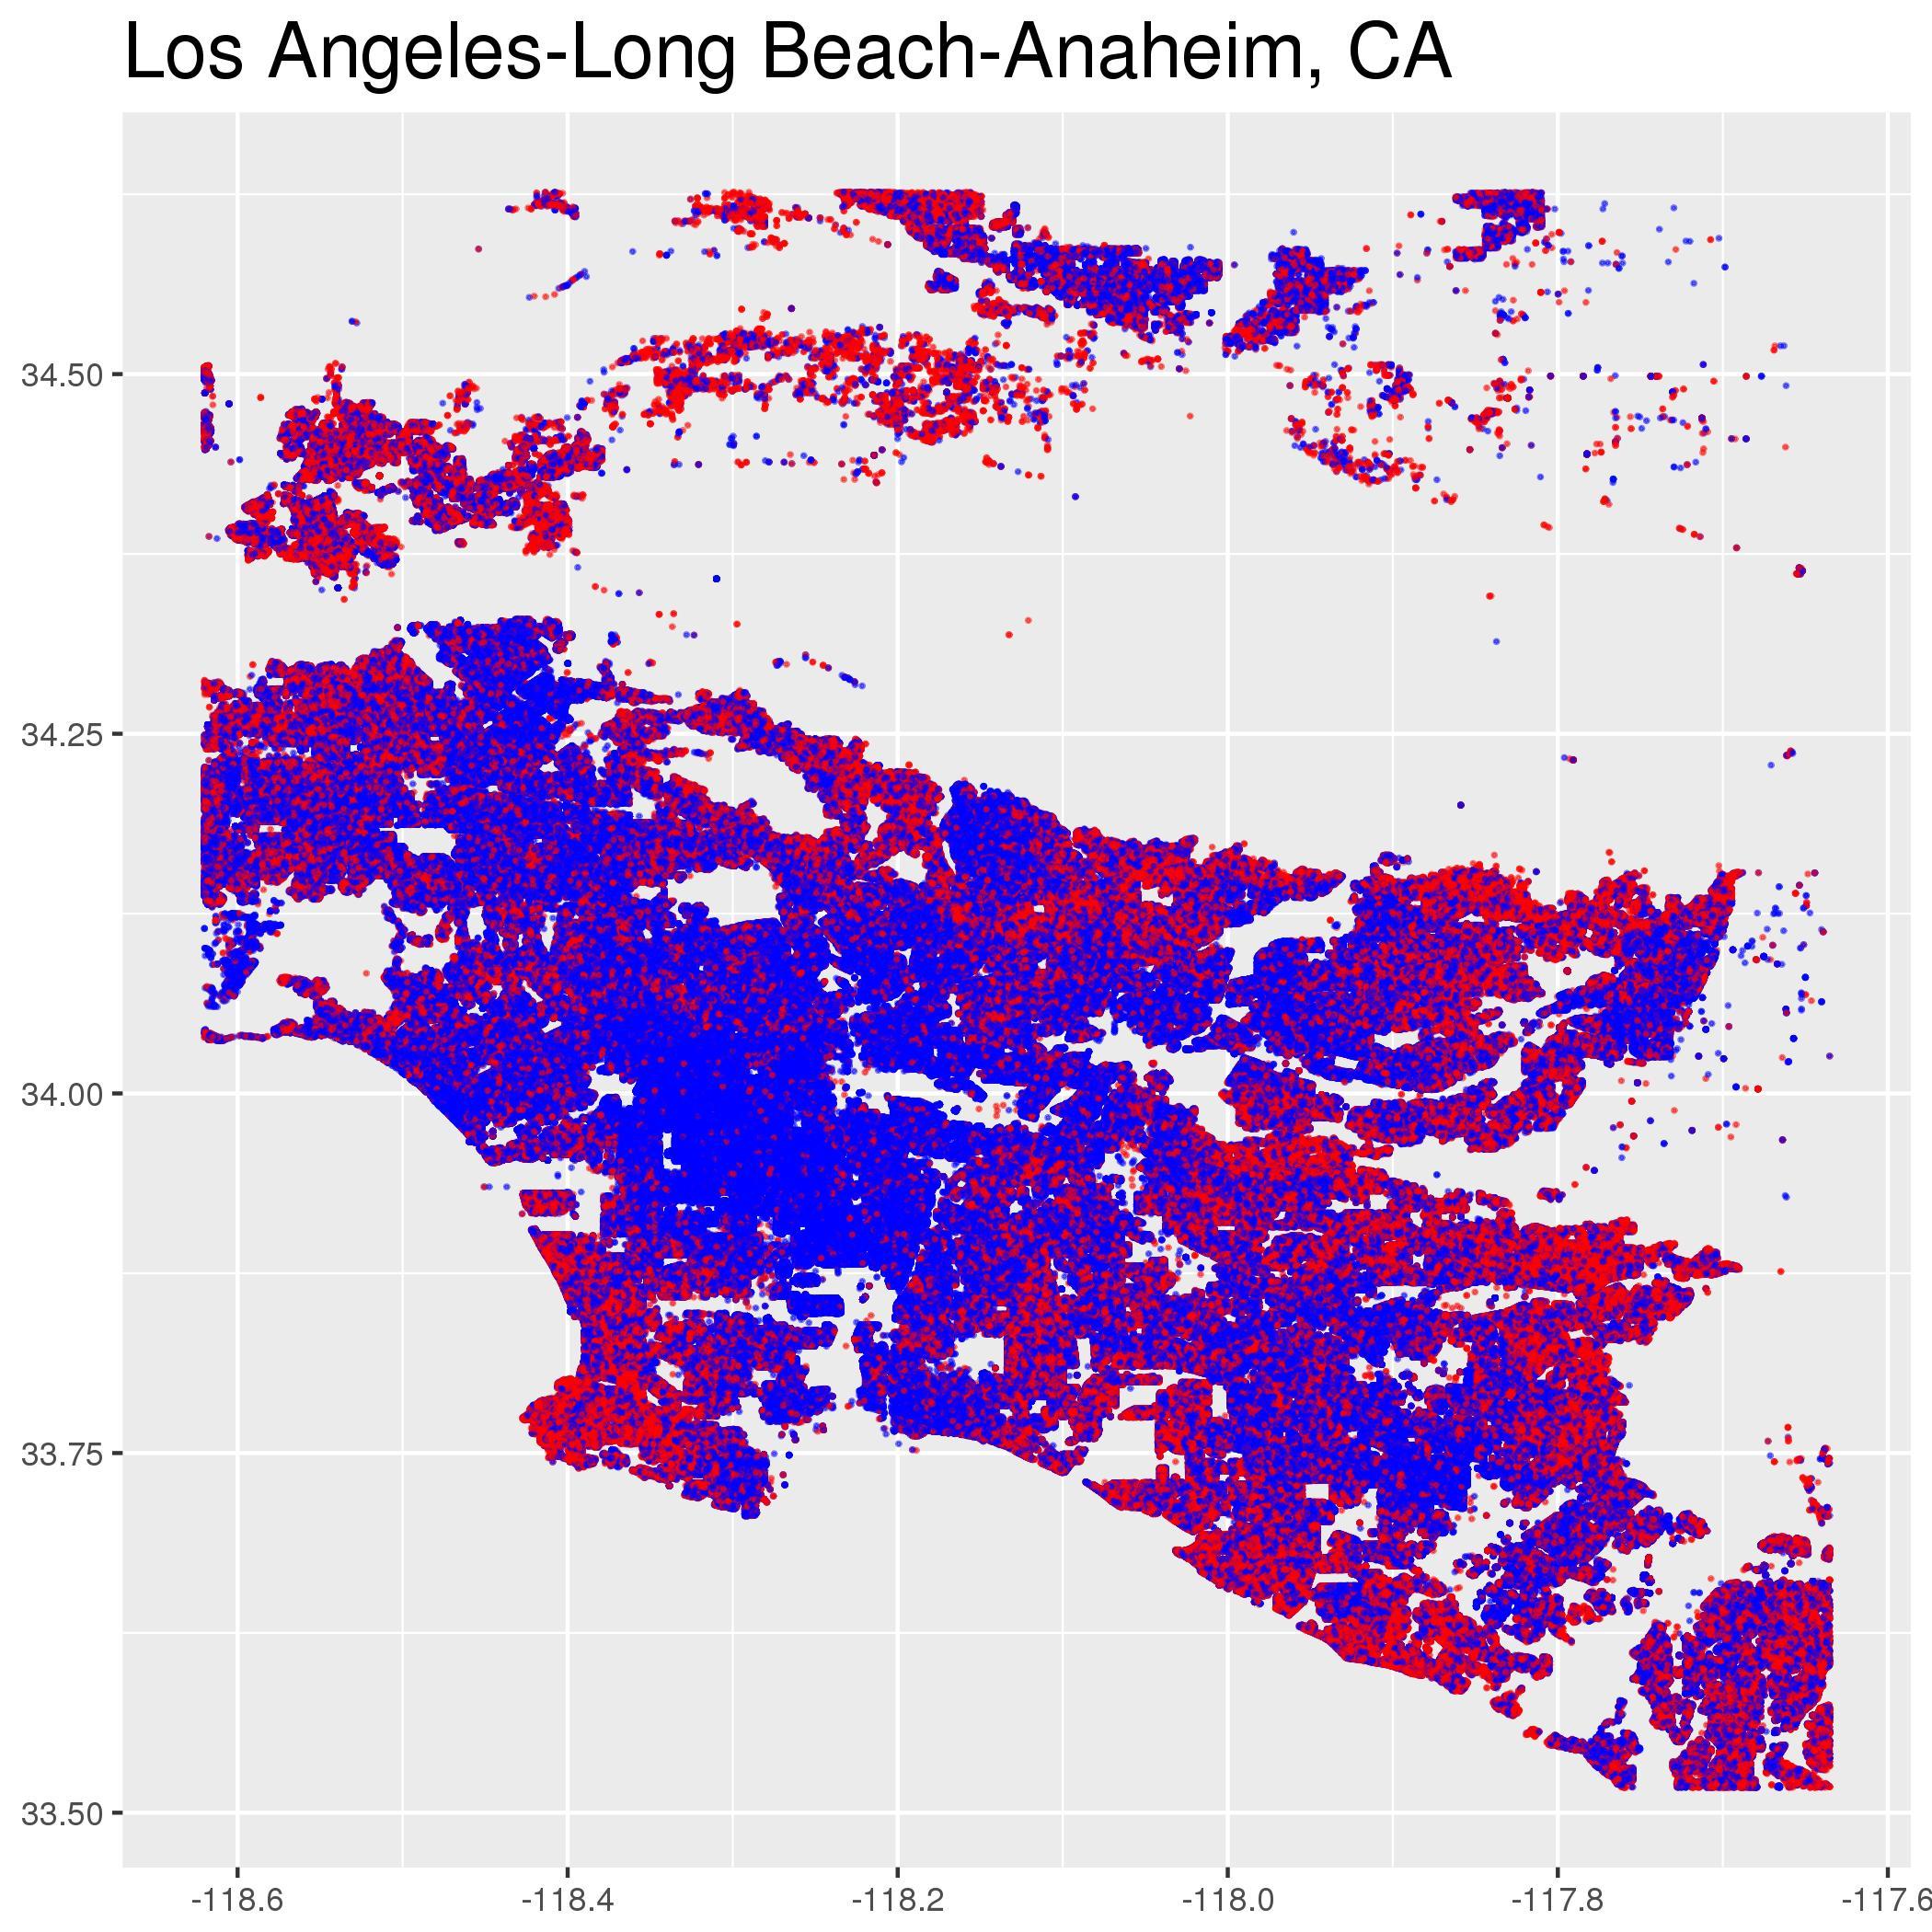 LosAngeles-LongBeach-AnaheimCA.jpeg